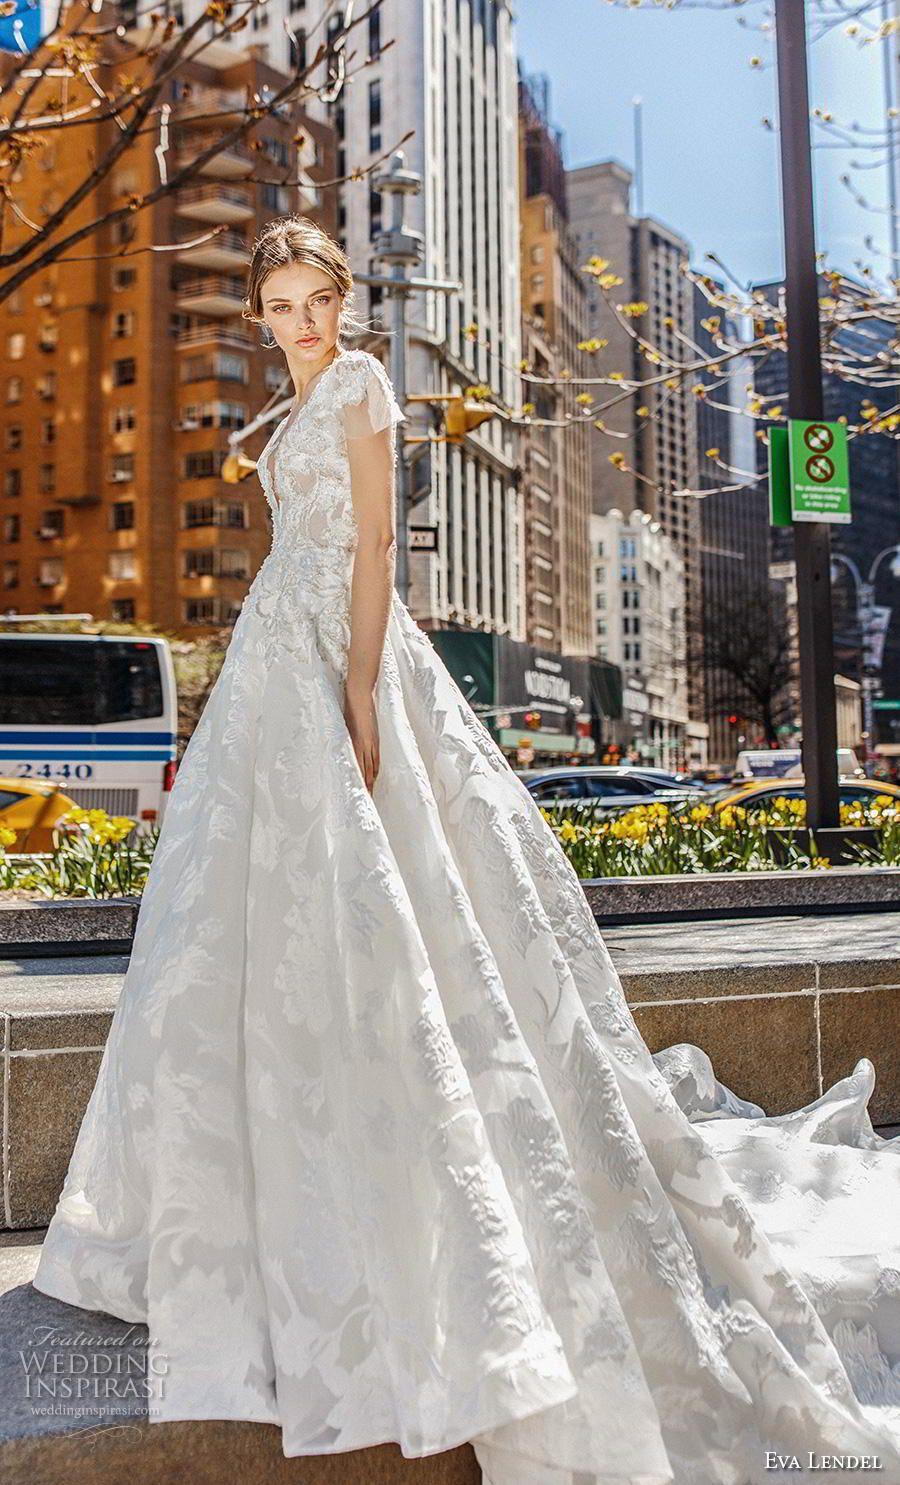 Lace up back wedding dress november 2018 Eva Lendel  Wedding Dresses u ucSunriseud Bridal Collection in